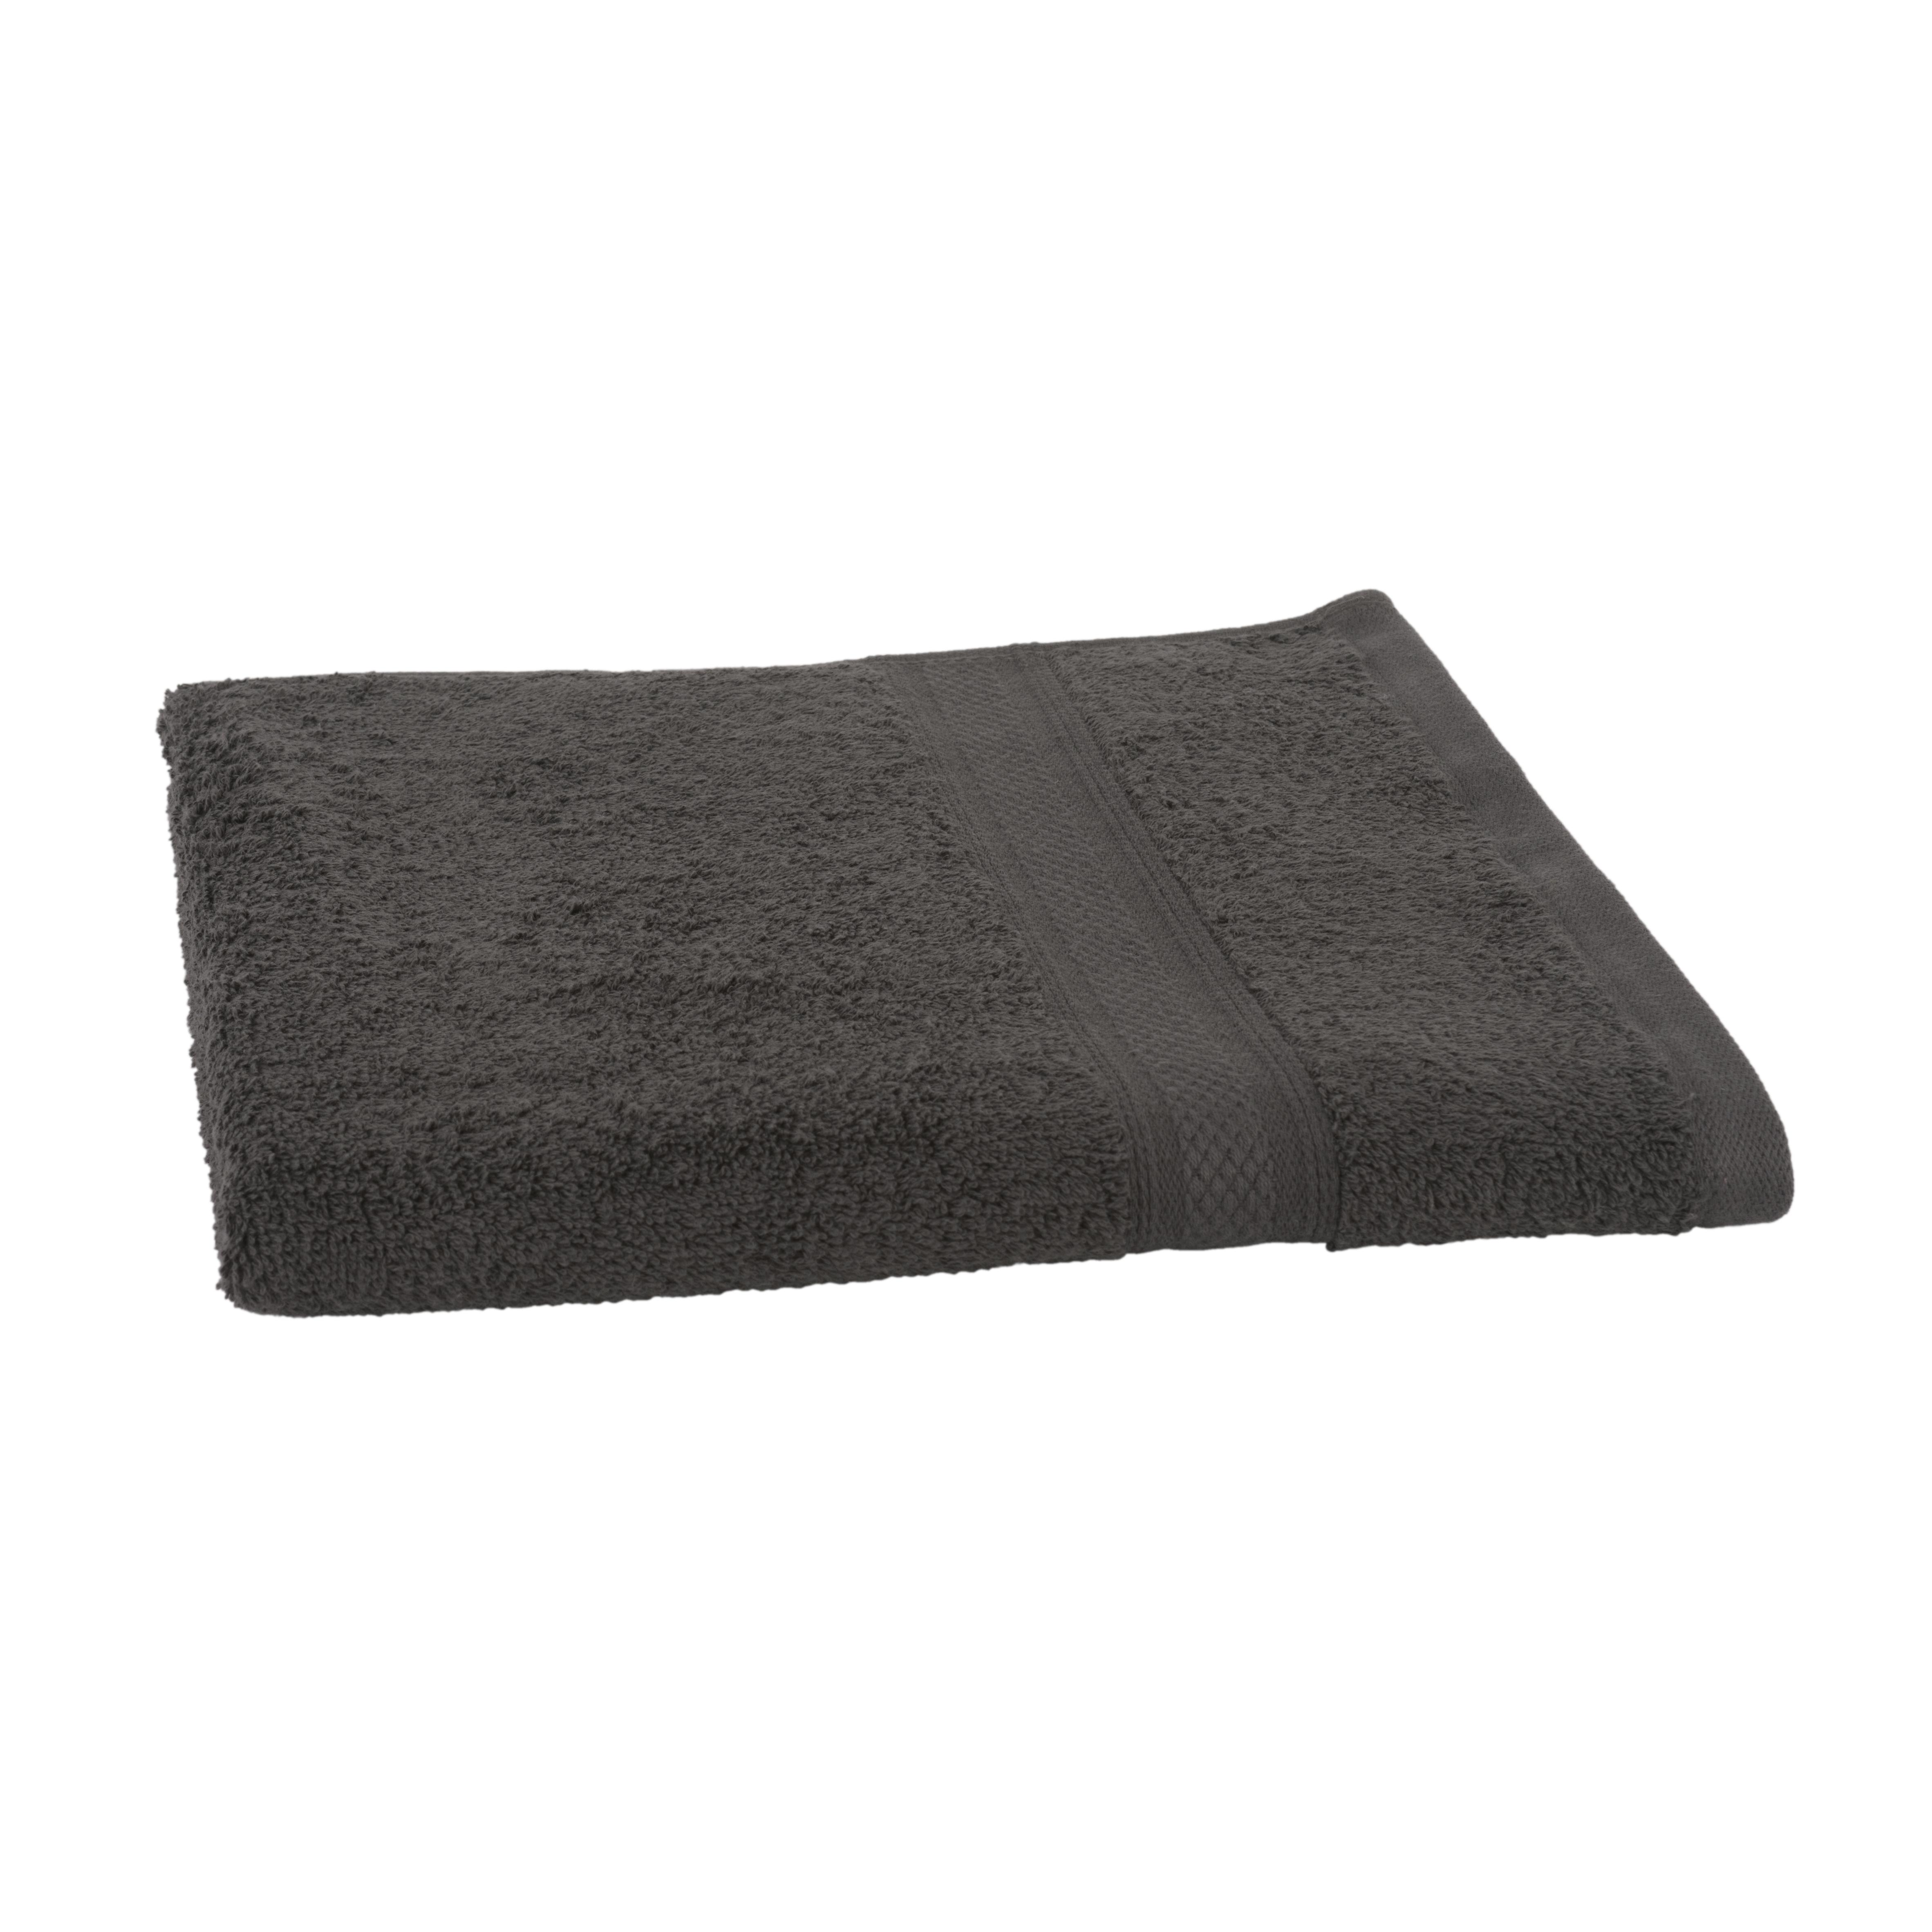 Clarysse Elegance Handdoek 60x110 500gram Antraciet